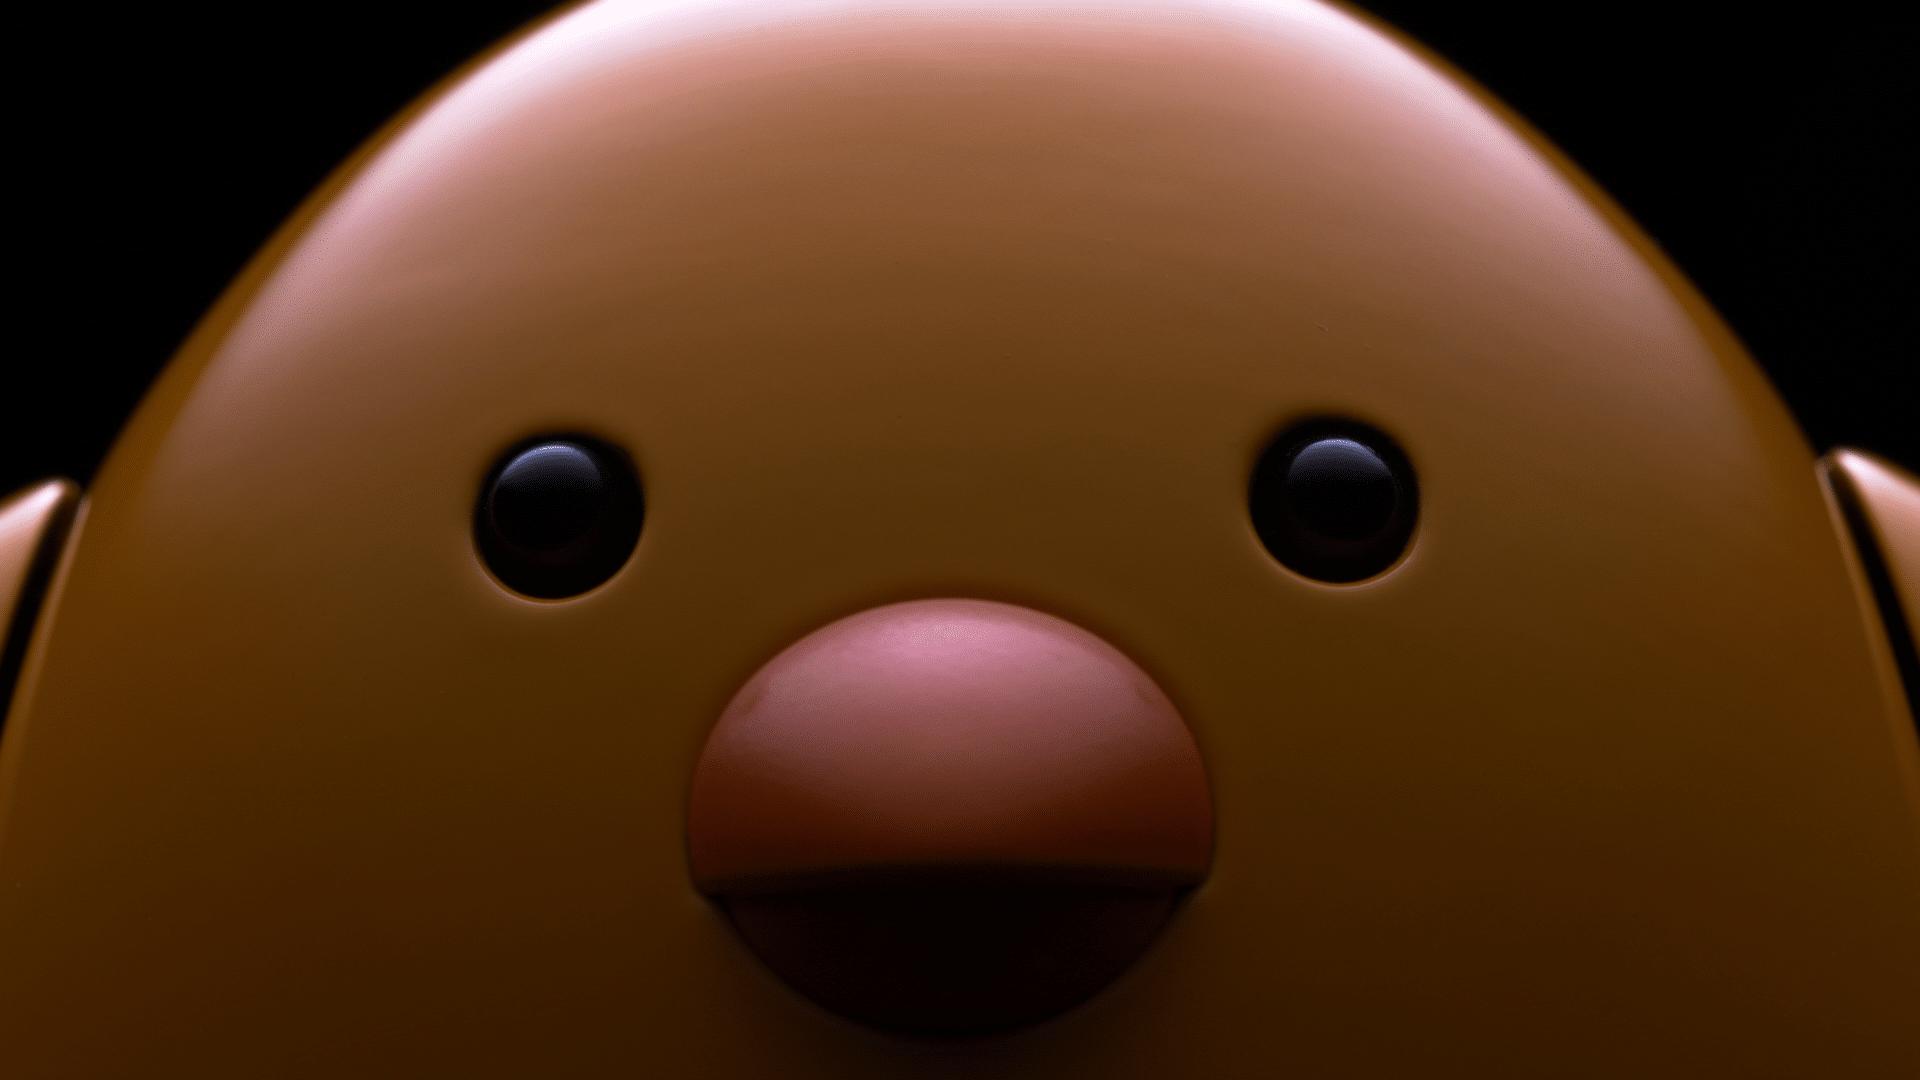 Robot chicken extreme close up